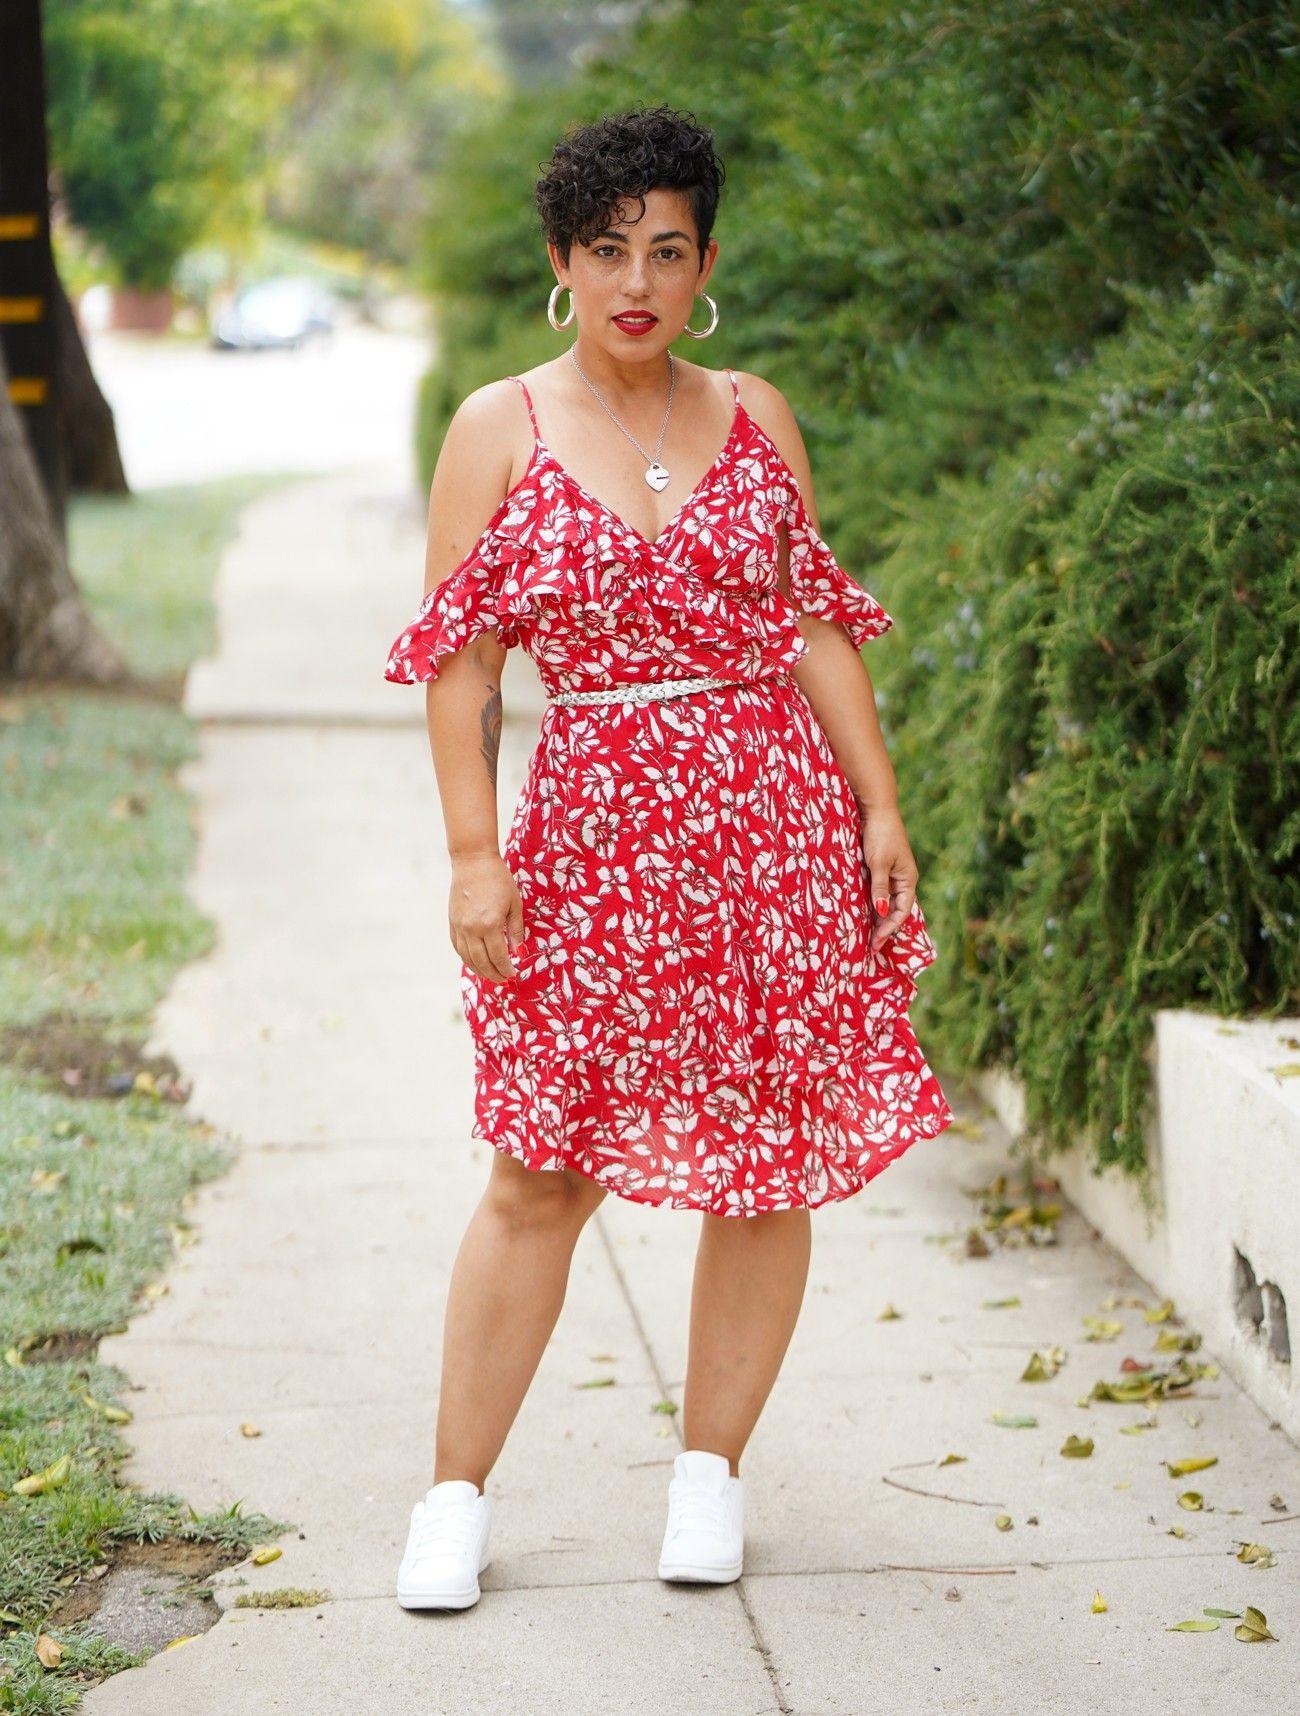 My Fun And Flirty Summer Dress Mimi G Style Summer Dresses Flirty Summer Dresses Dresses [ 1716 x 1300 Pixel ]